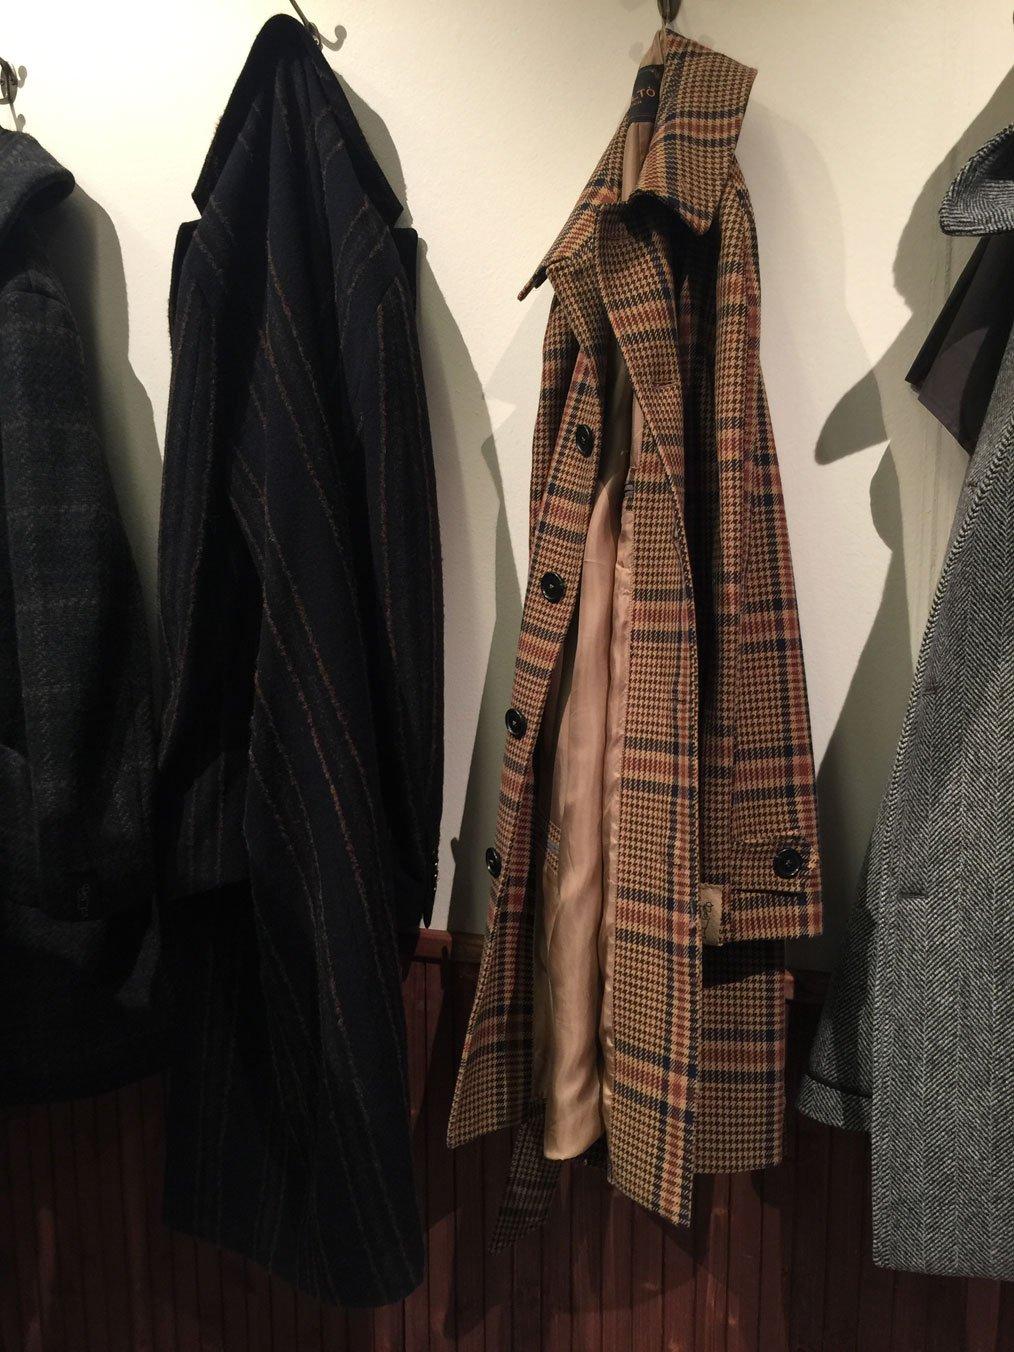 Cappotto Uomo Paltò Autunno Inverno 2017 2018